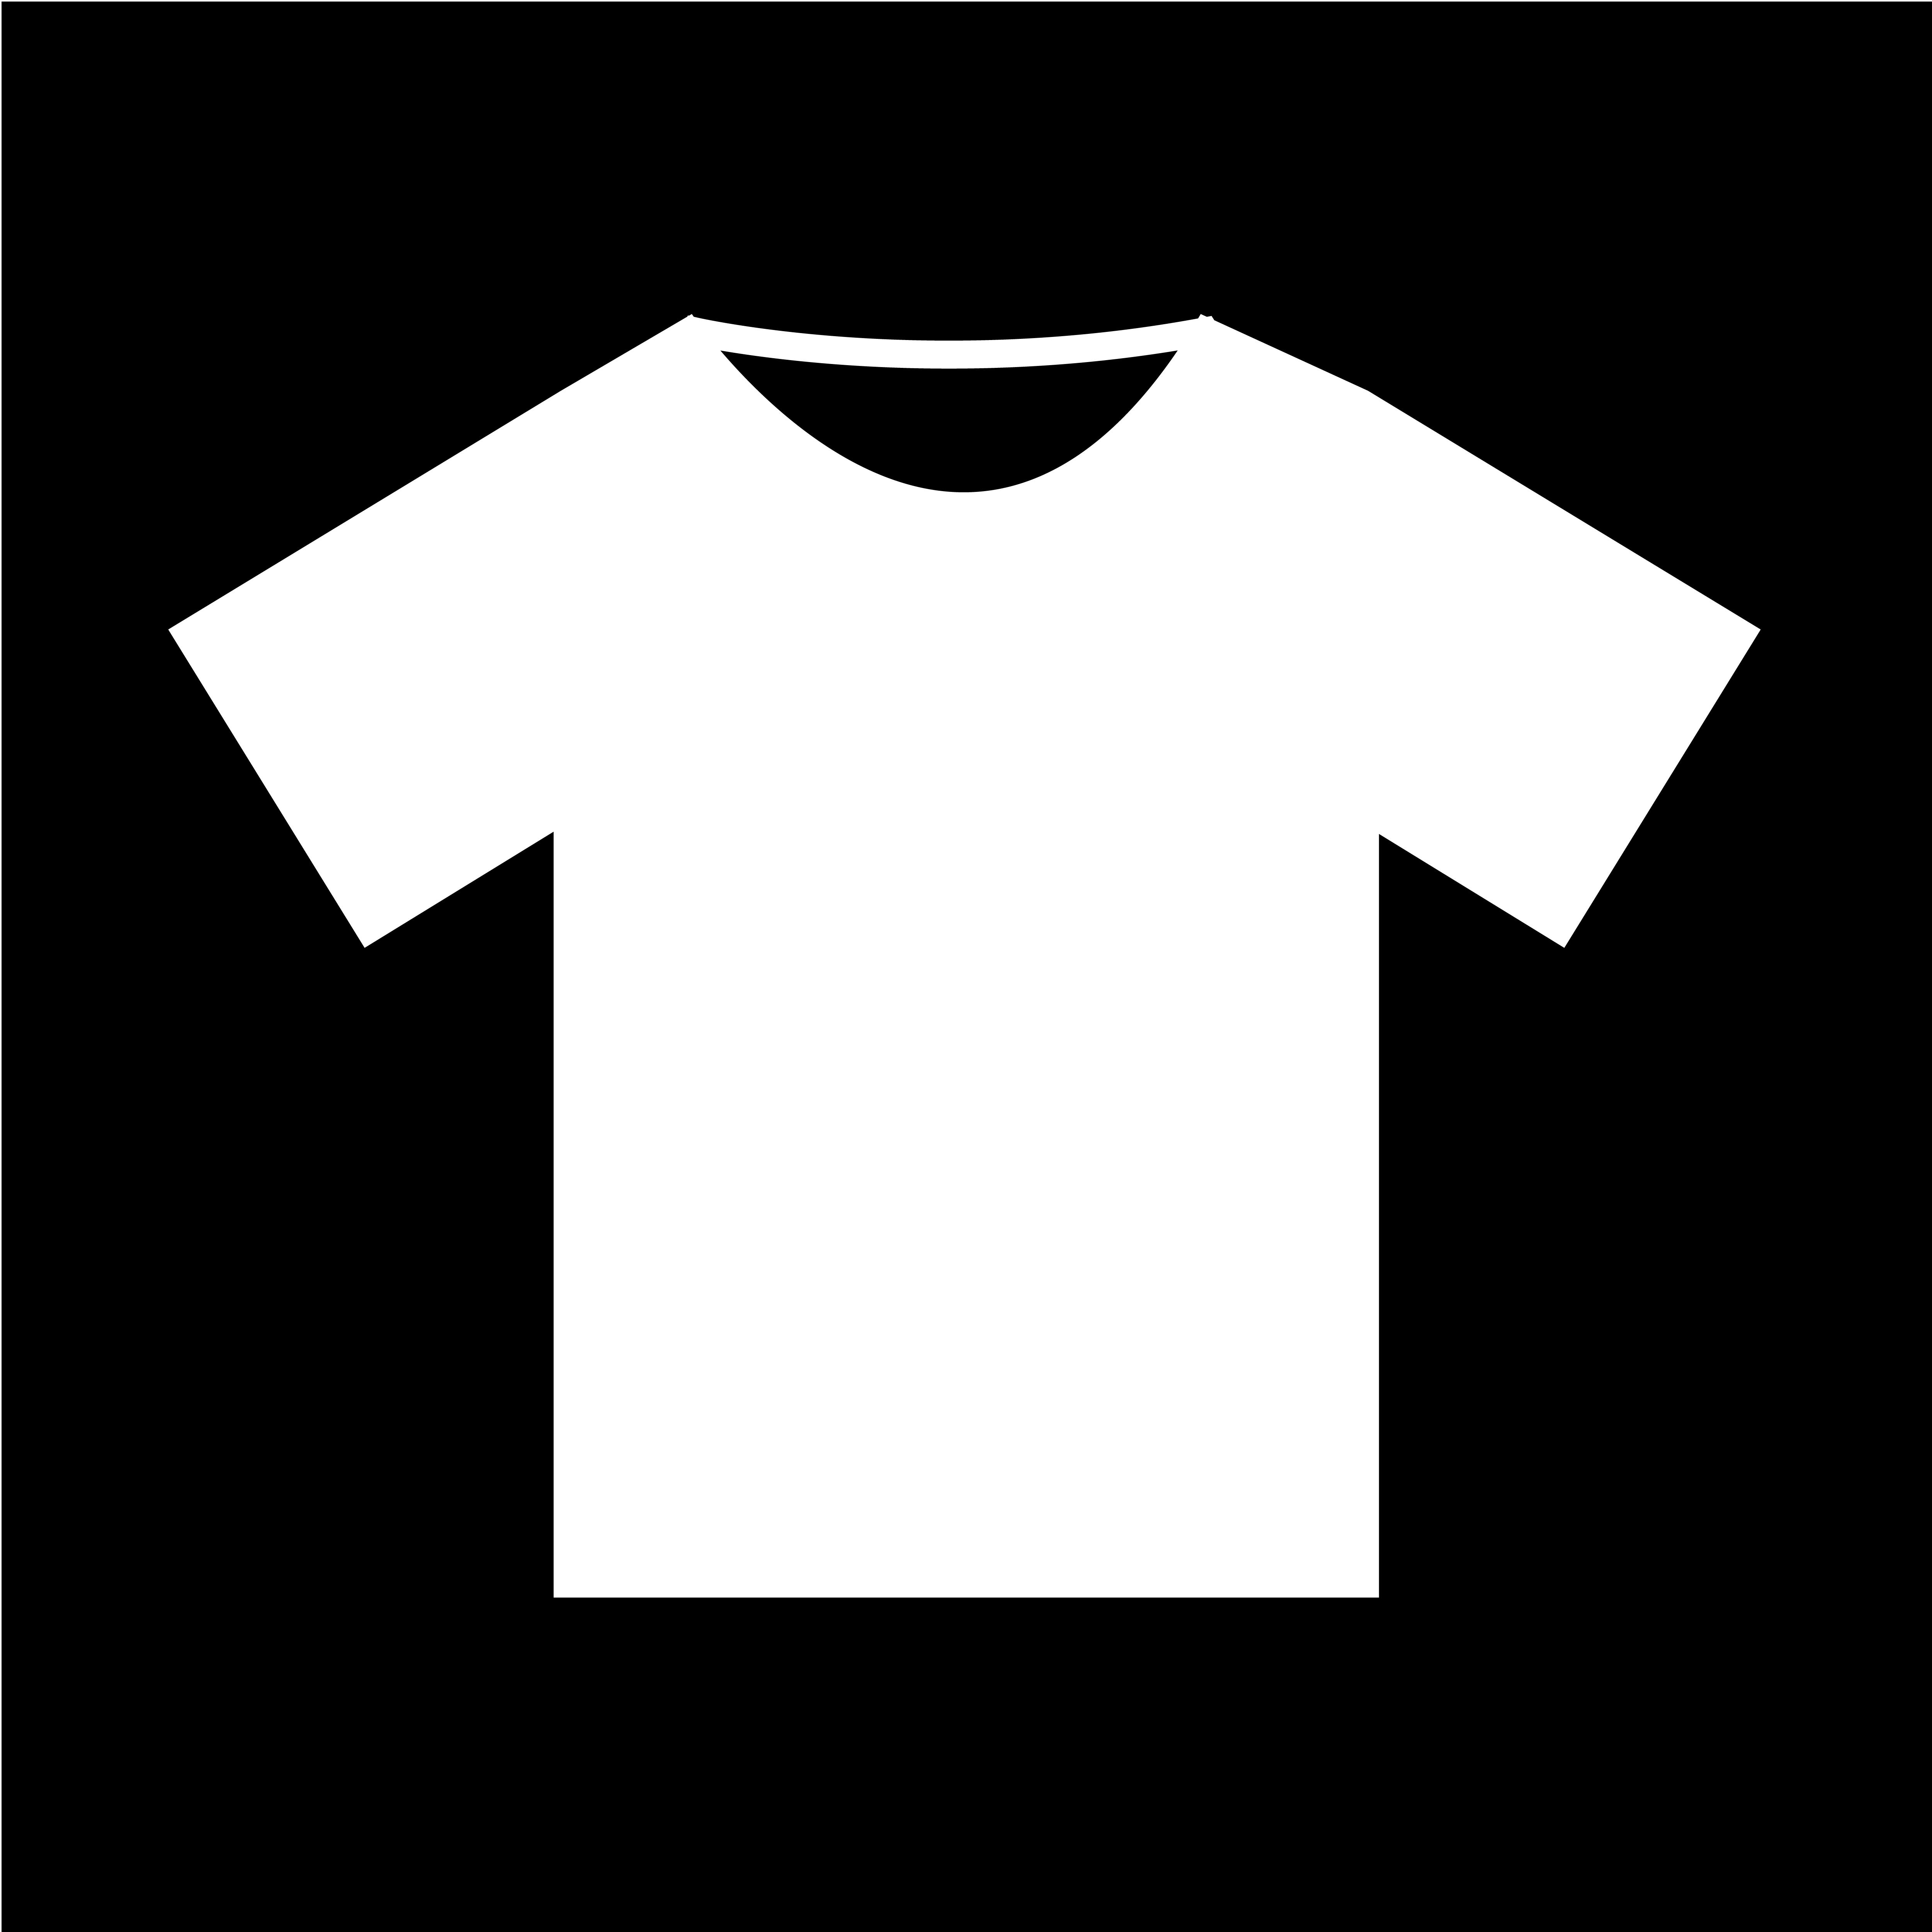 tshirt icon vector illustration download free vectors clipart graphics vector art https www vecteezy com vector art 581814 tshirt icon vector illustration